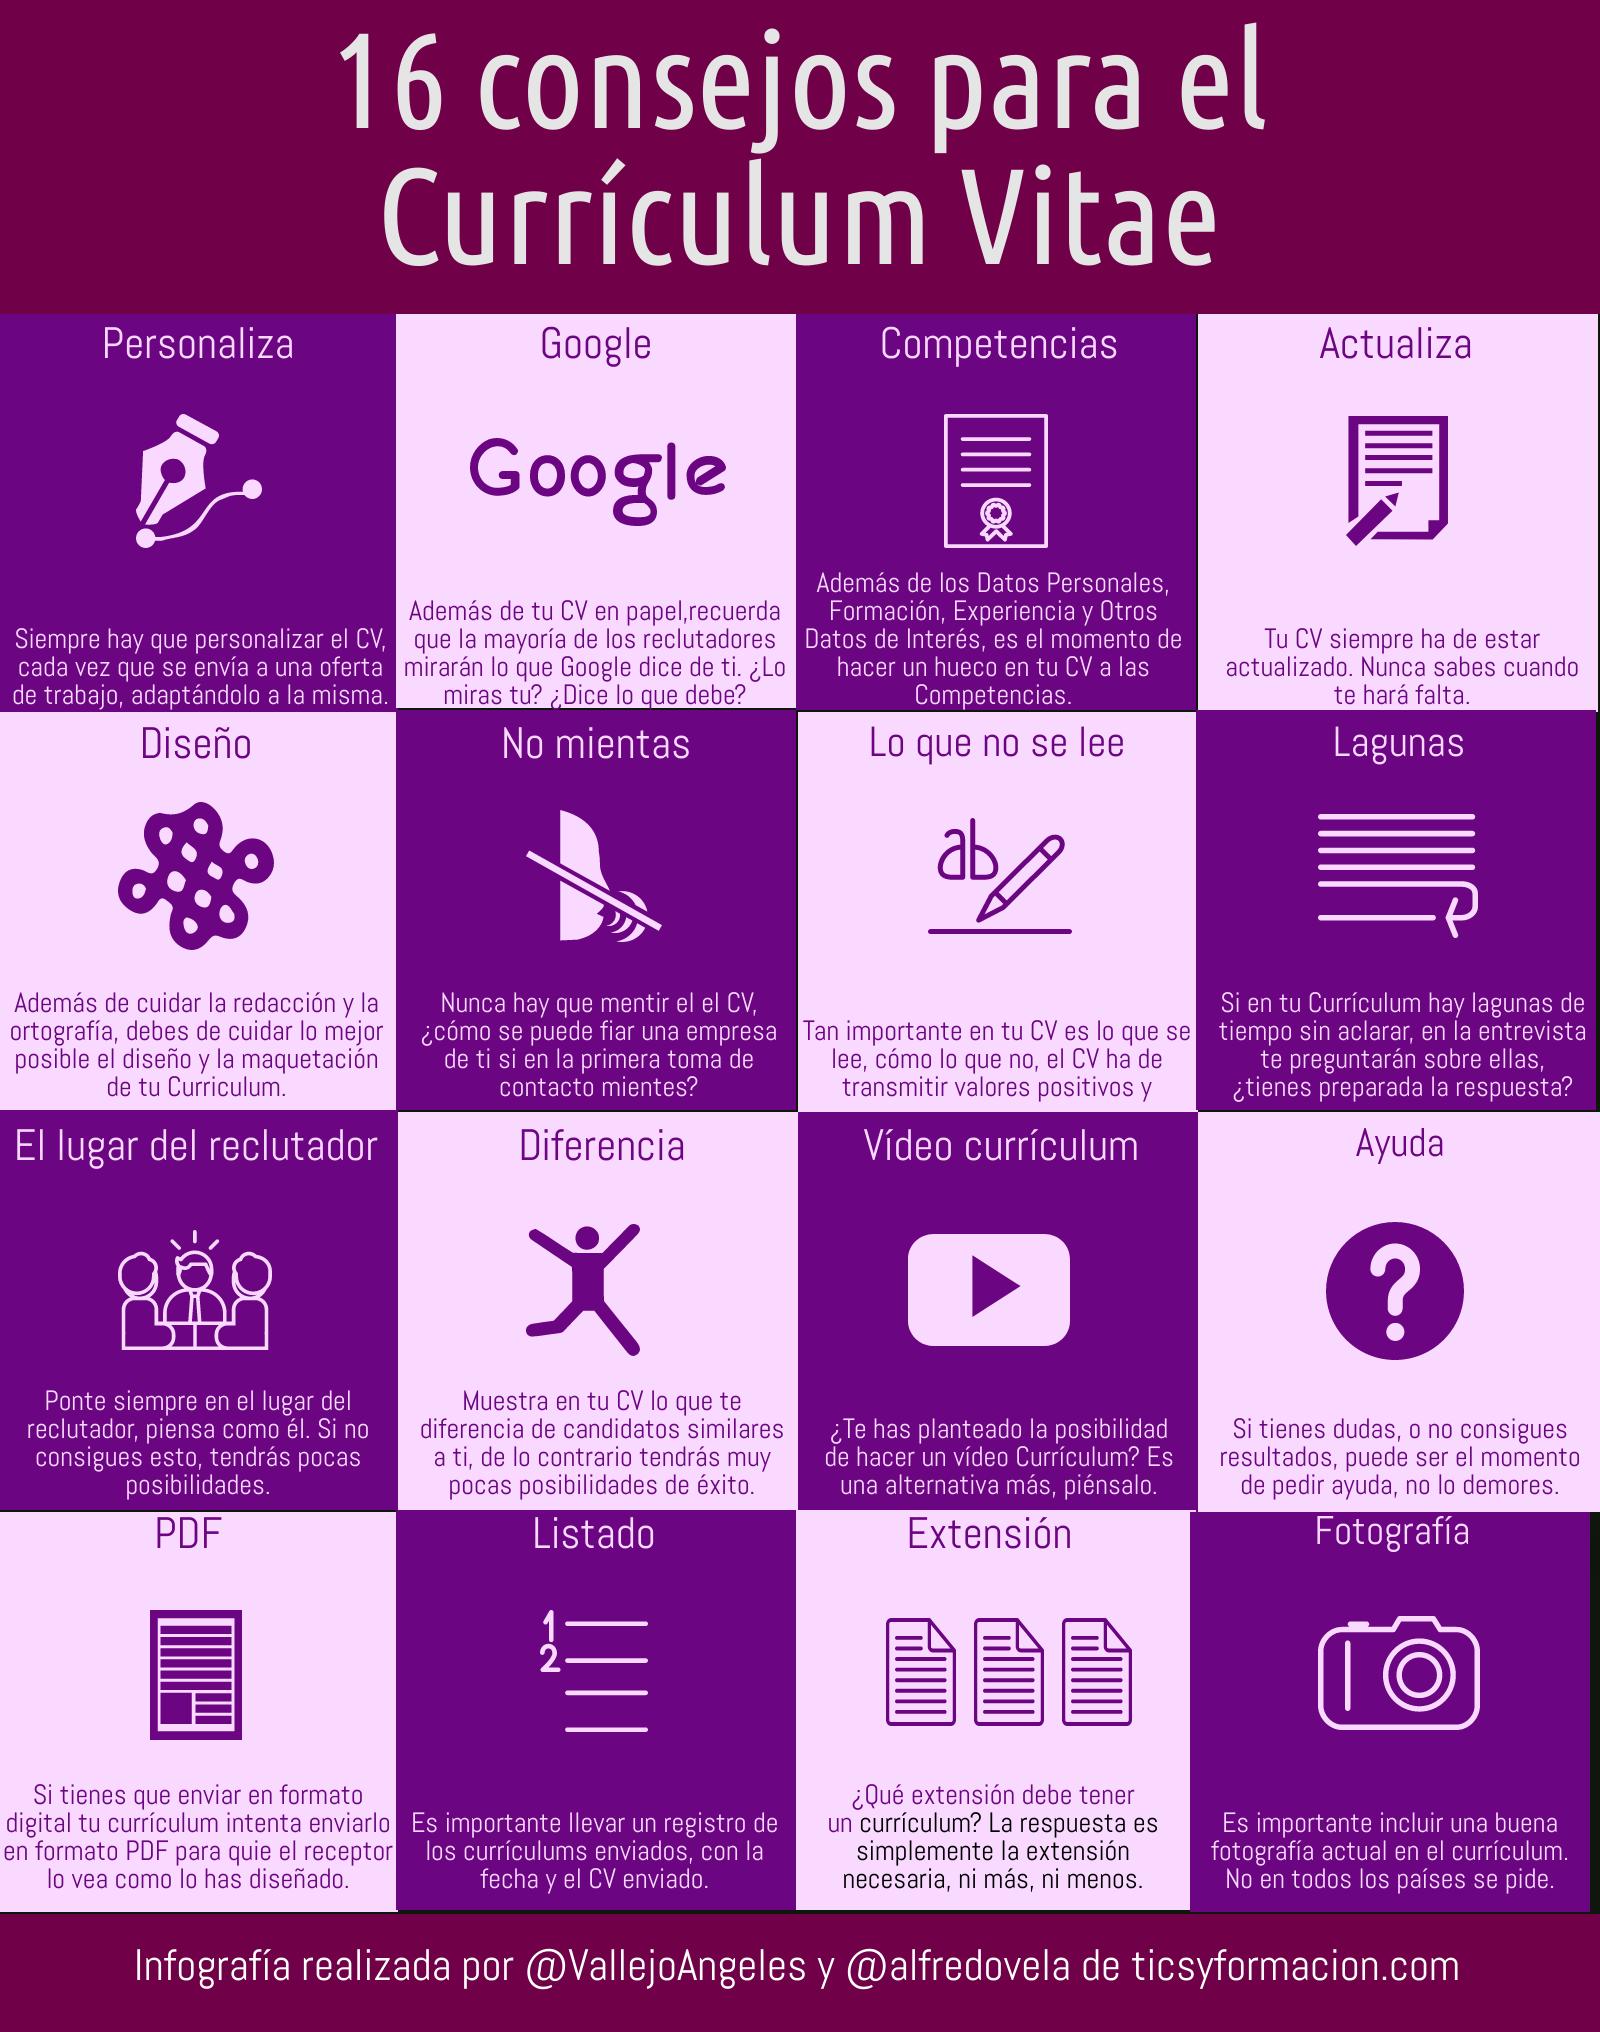 16 consejos para tu Currículum Vitae #Infografia #Empleo #FOL #OrientaciónLaboral